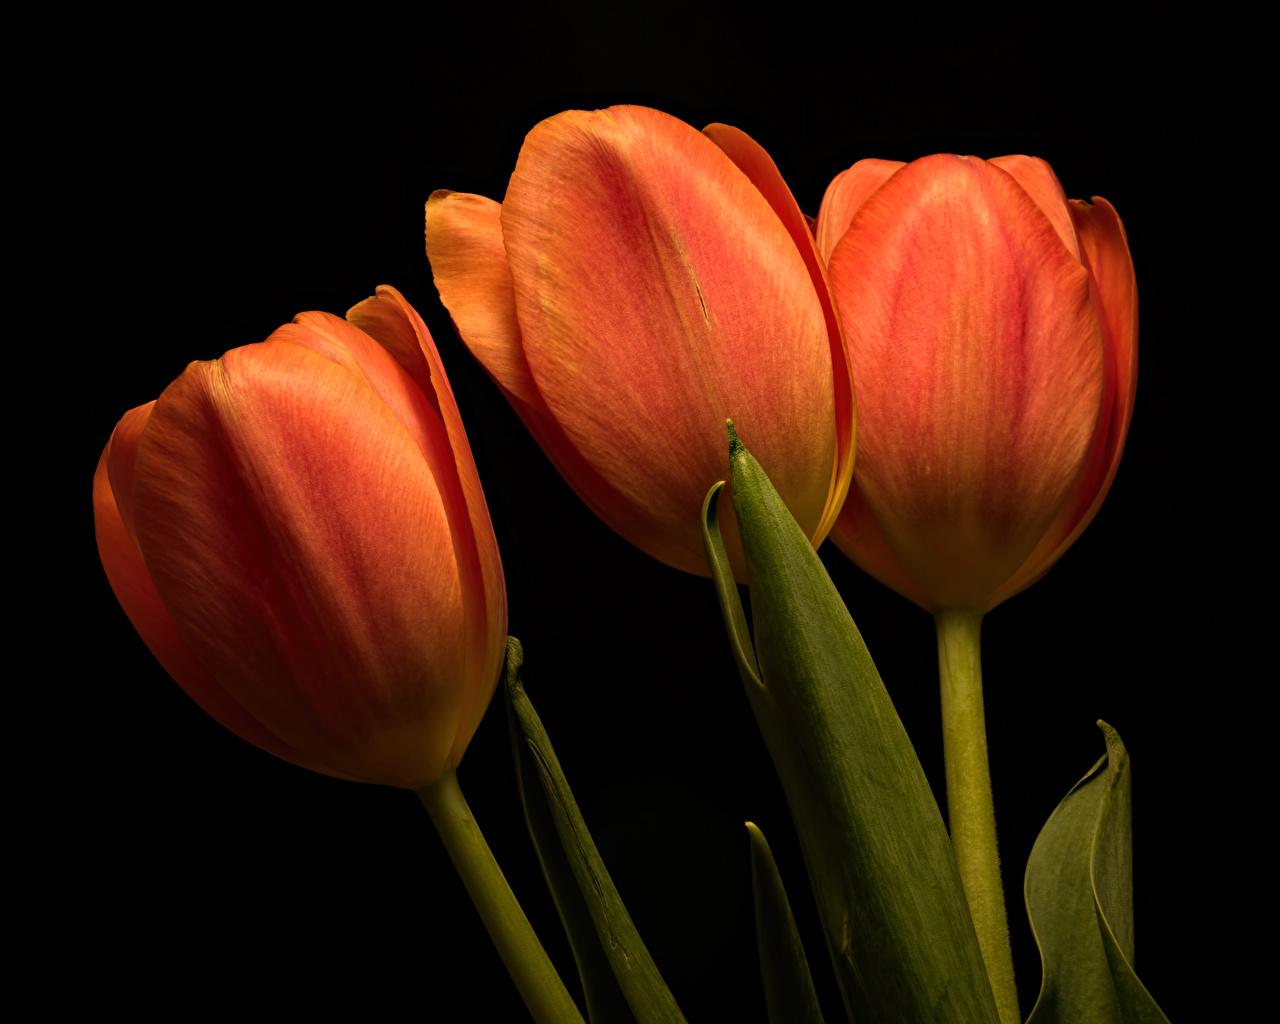 Images Tulips Orange Flowers Three 3 Closeup Black background tulip flower